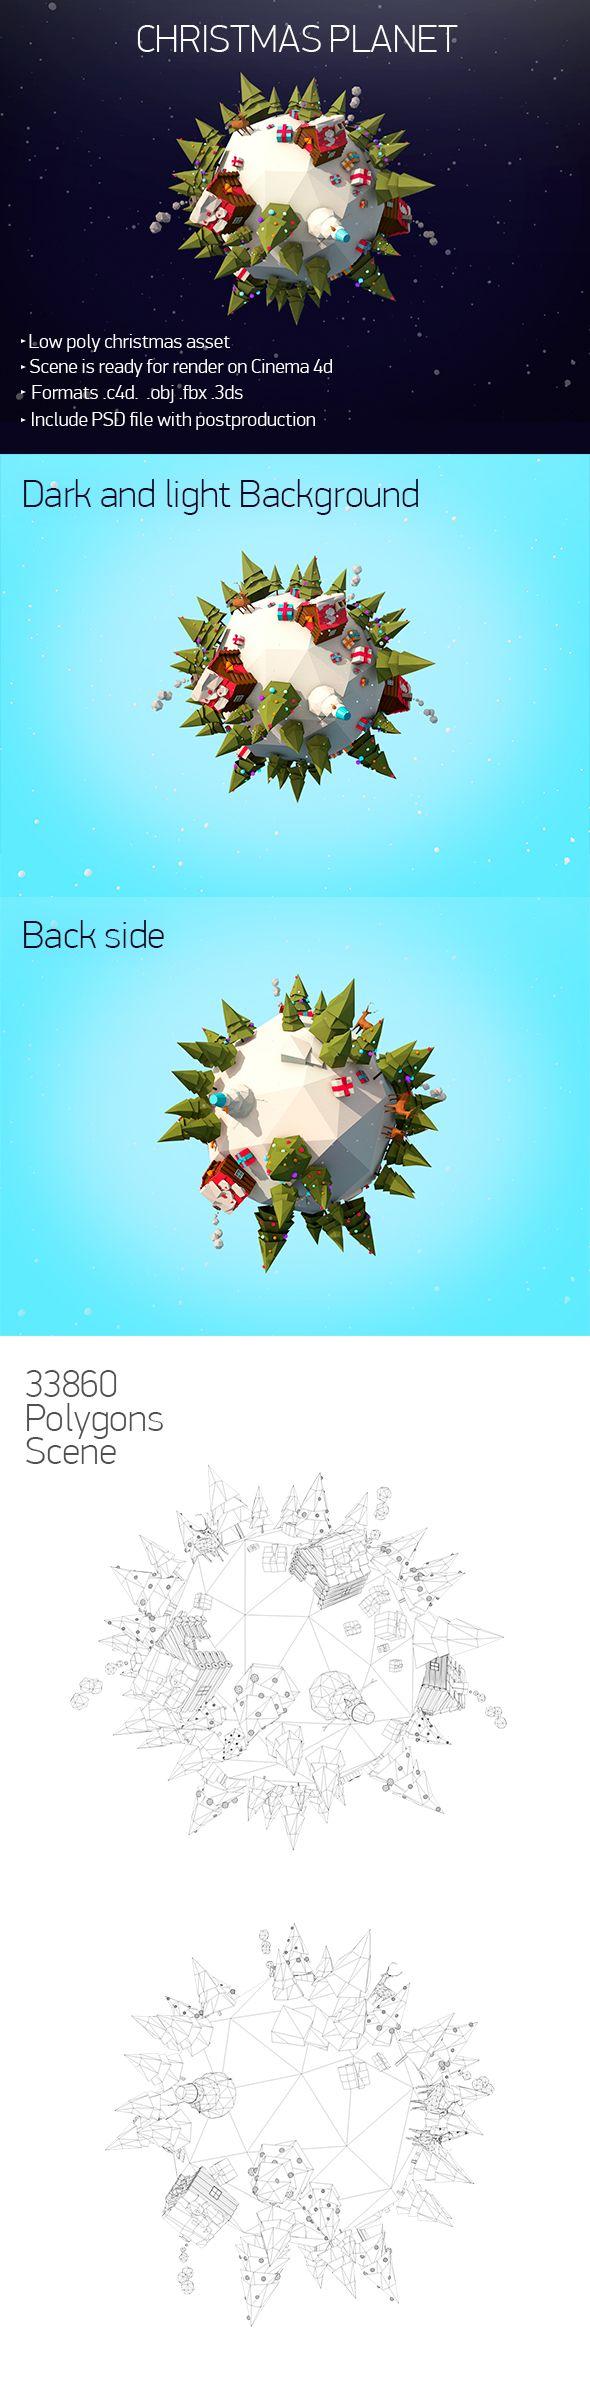 Low Poly Christmas planet 3D Models Design Template #cinema4d #3D Download here: https://3docean.net/item/christmas-planet/13794031?ref=yinkira